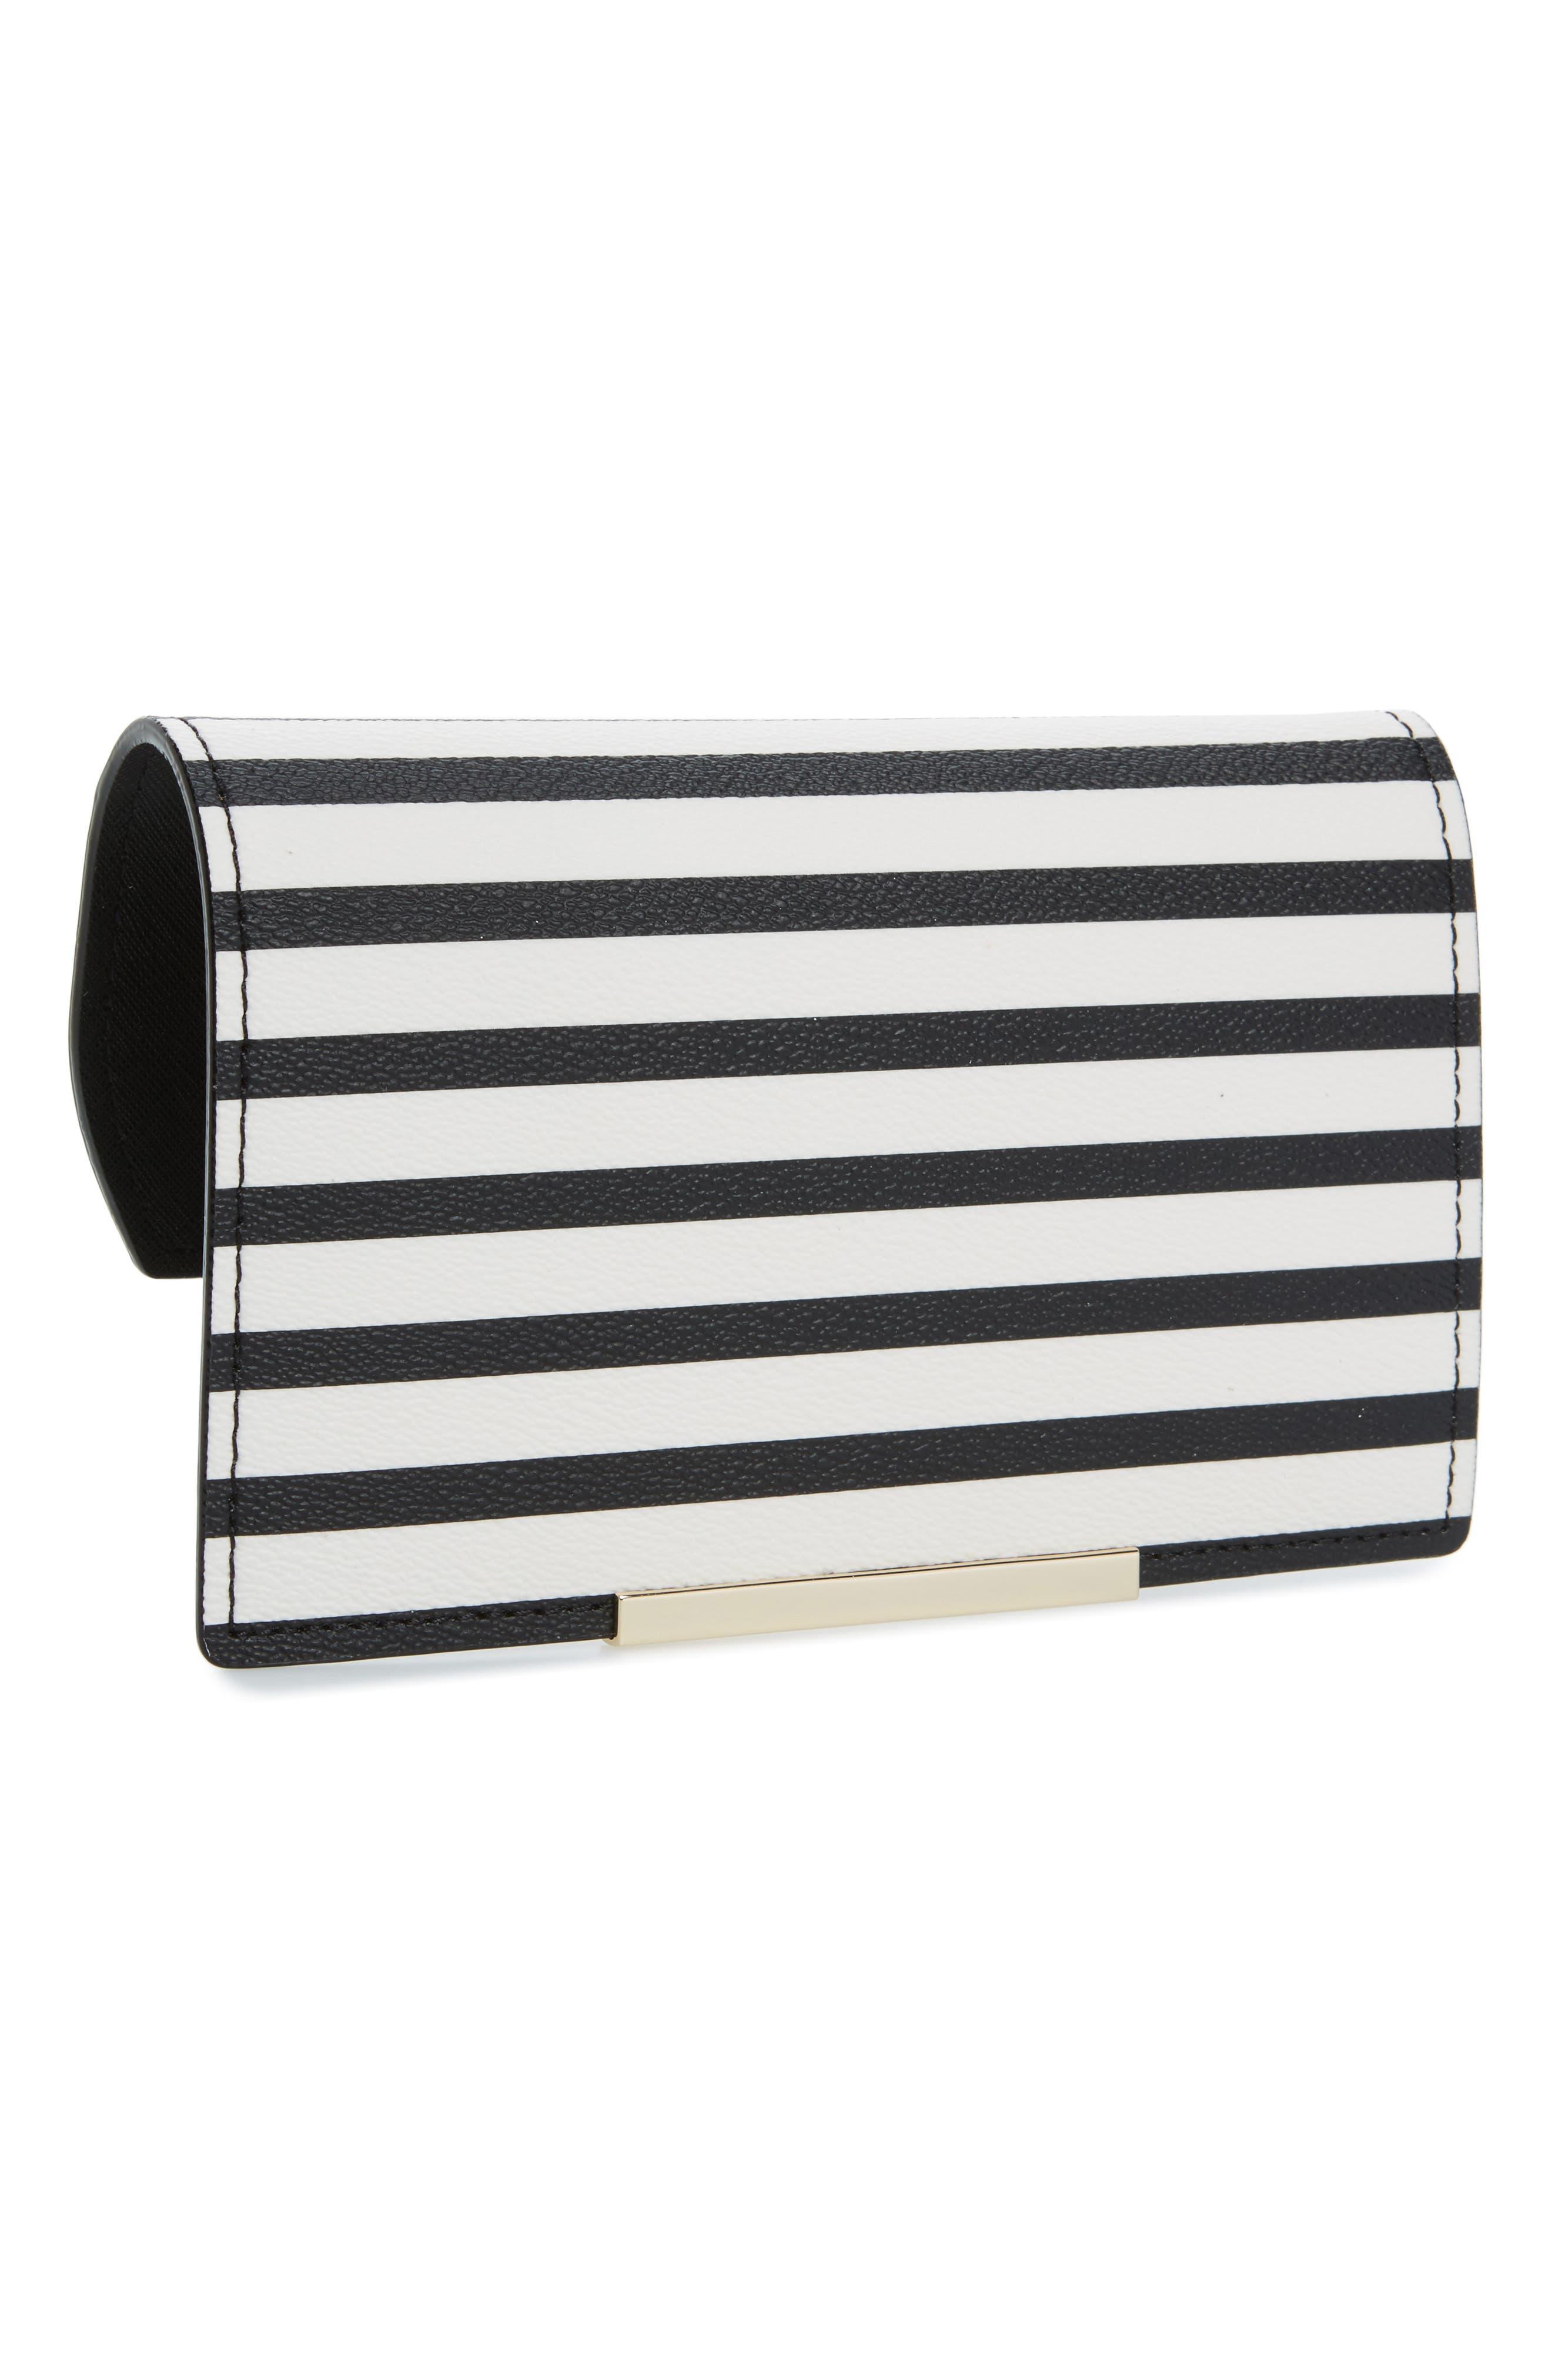 make it mine stripe snap-on accent flap,                             Main thumbnail 1, color,                             900